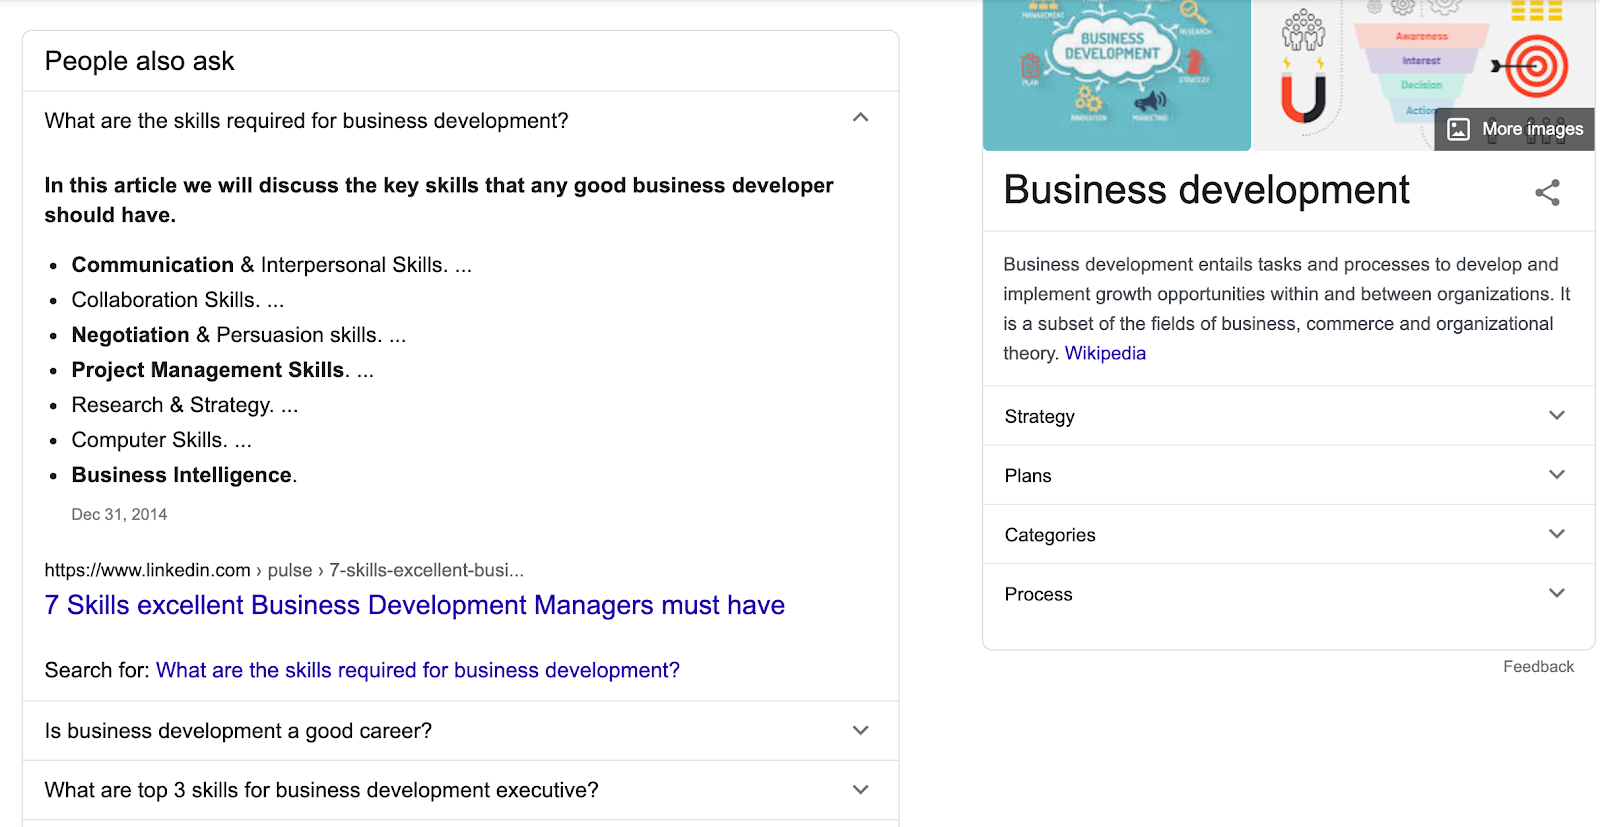 Google SMITH algorithm